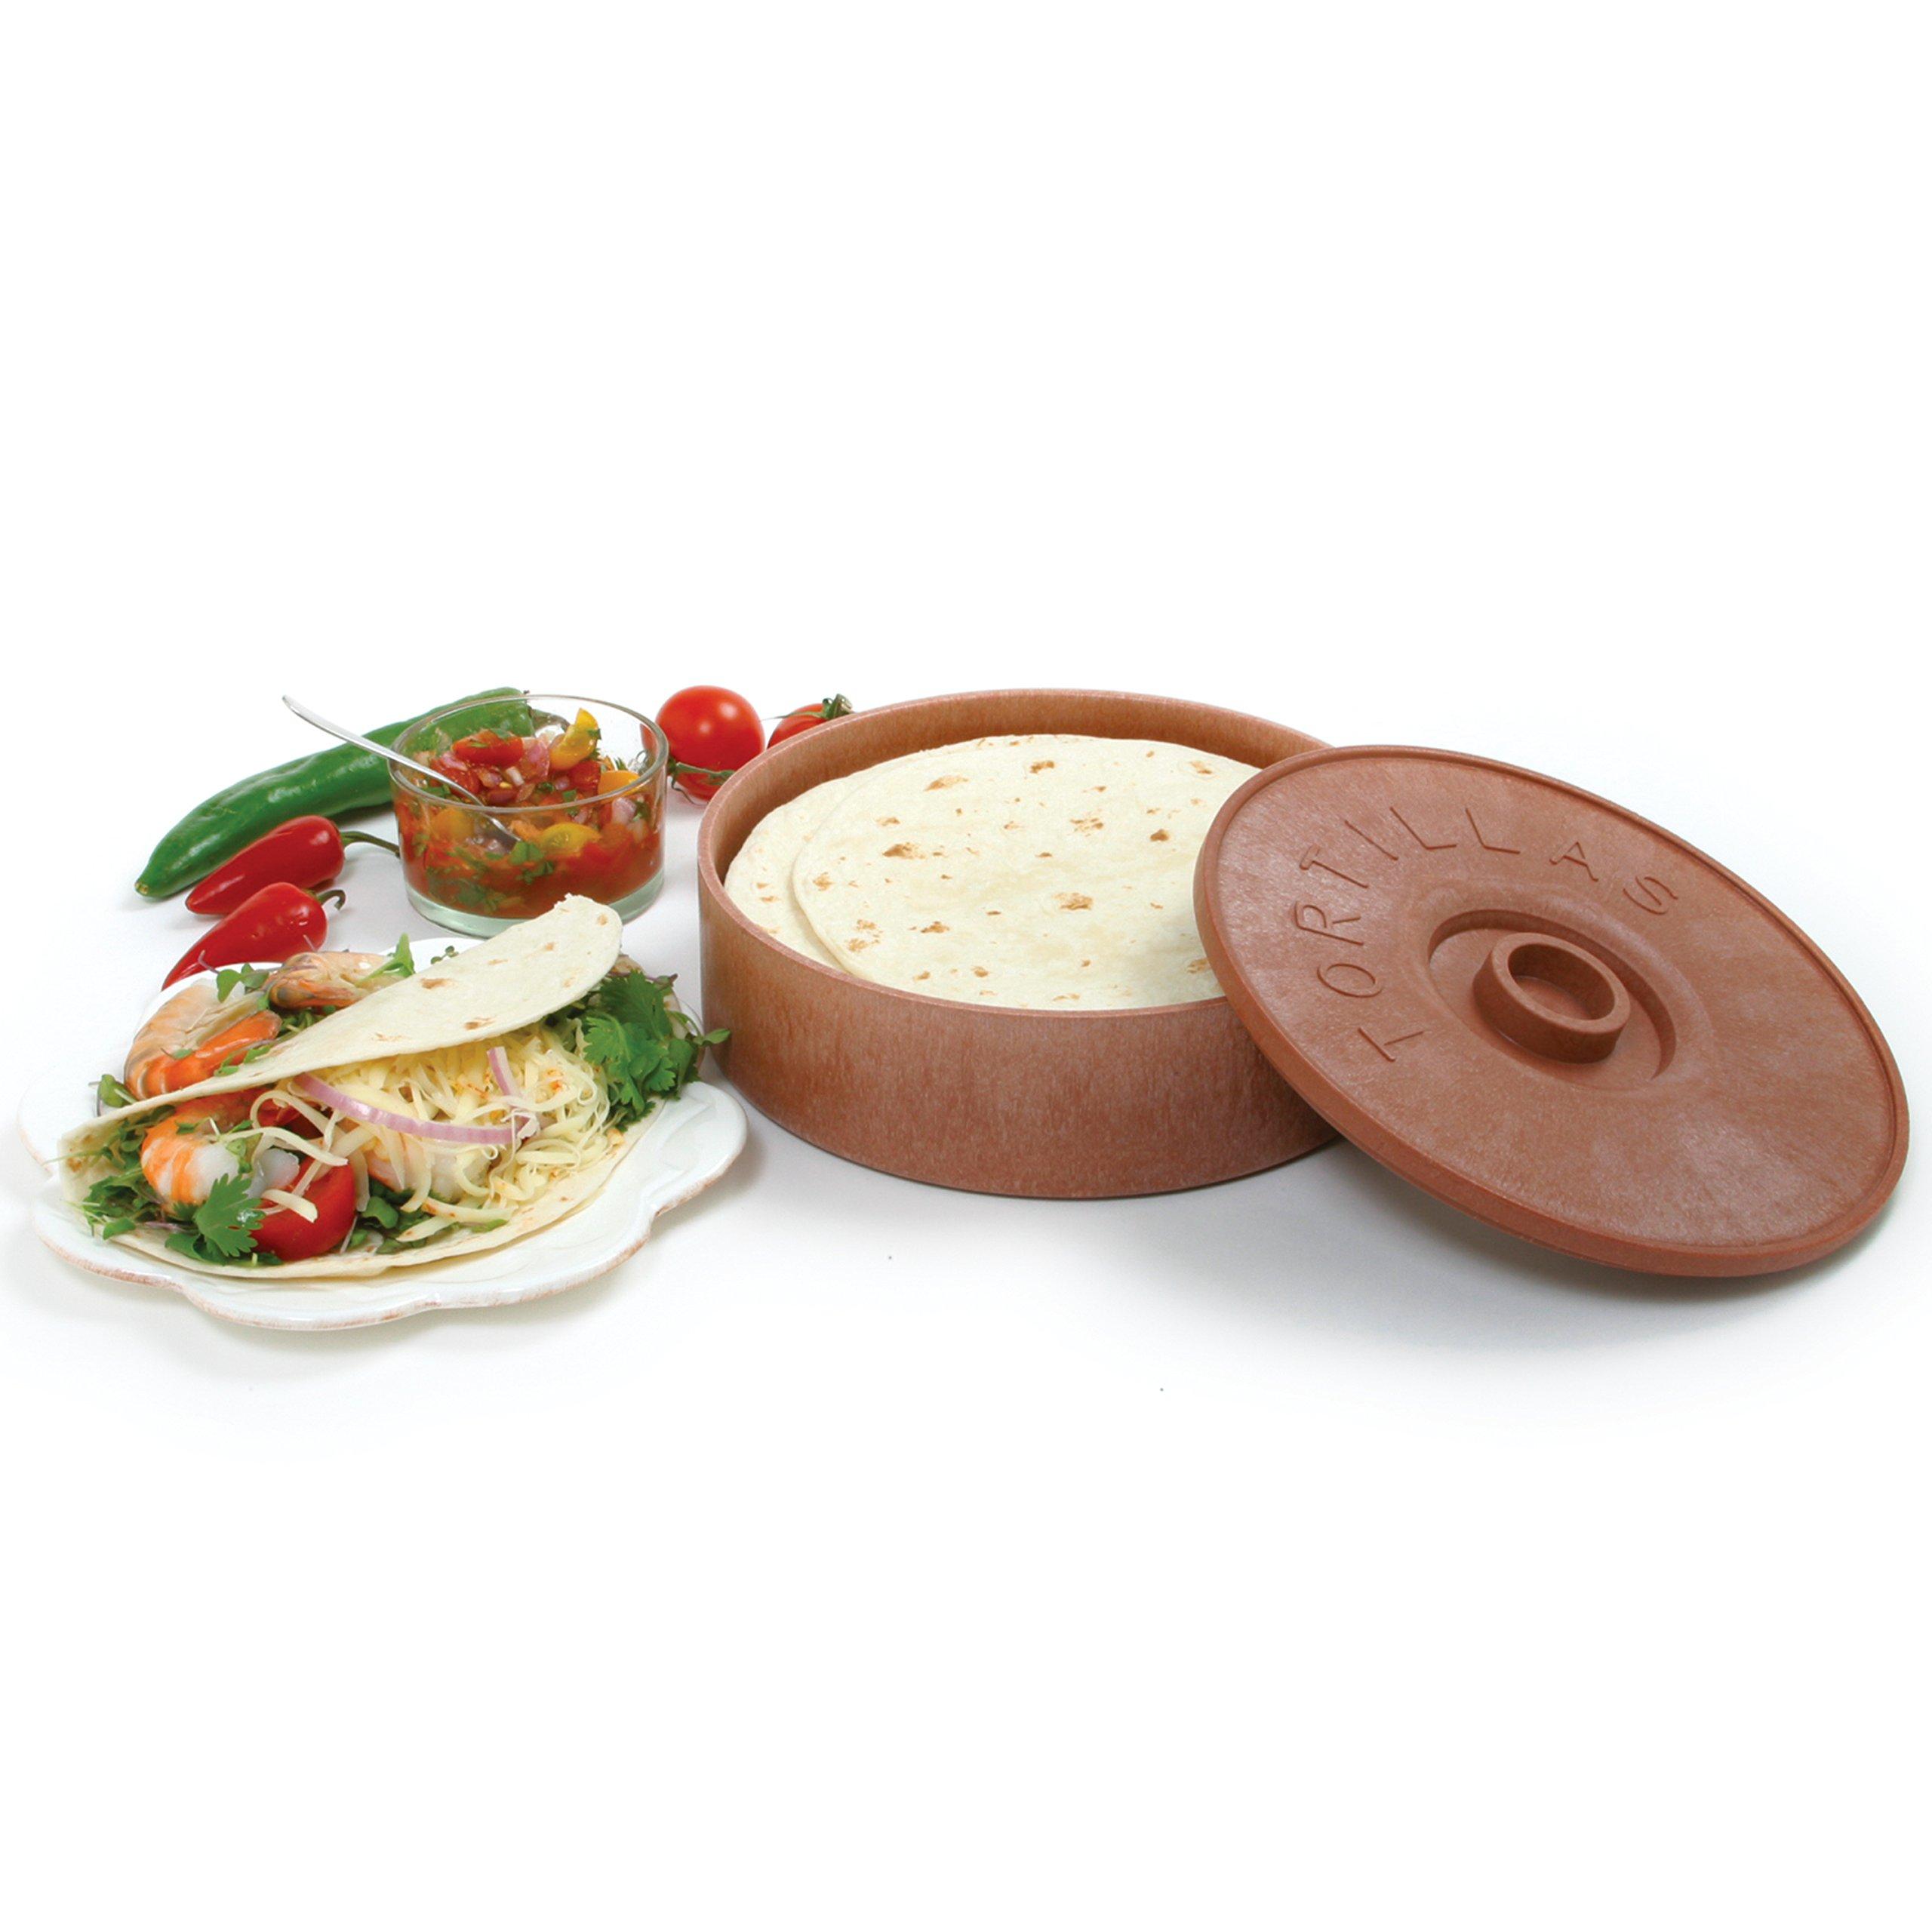 Norpro Tortilla Keeper by Norpro